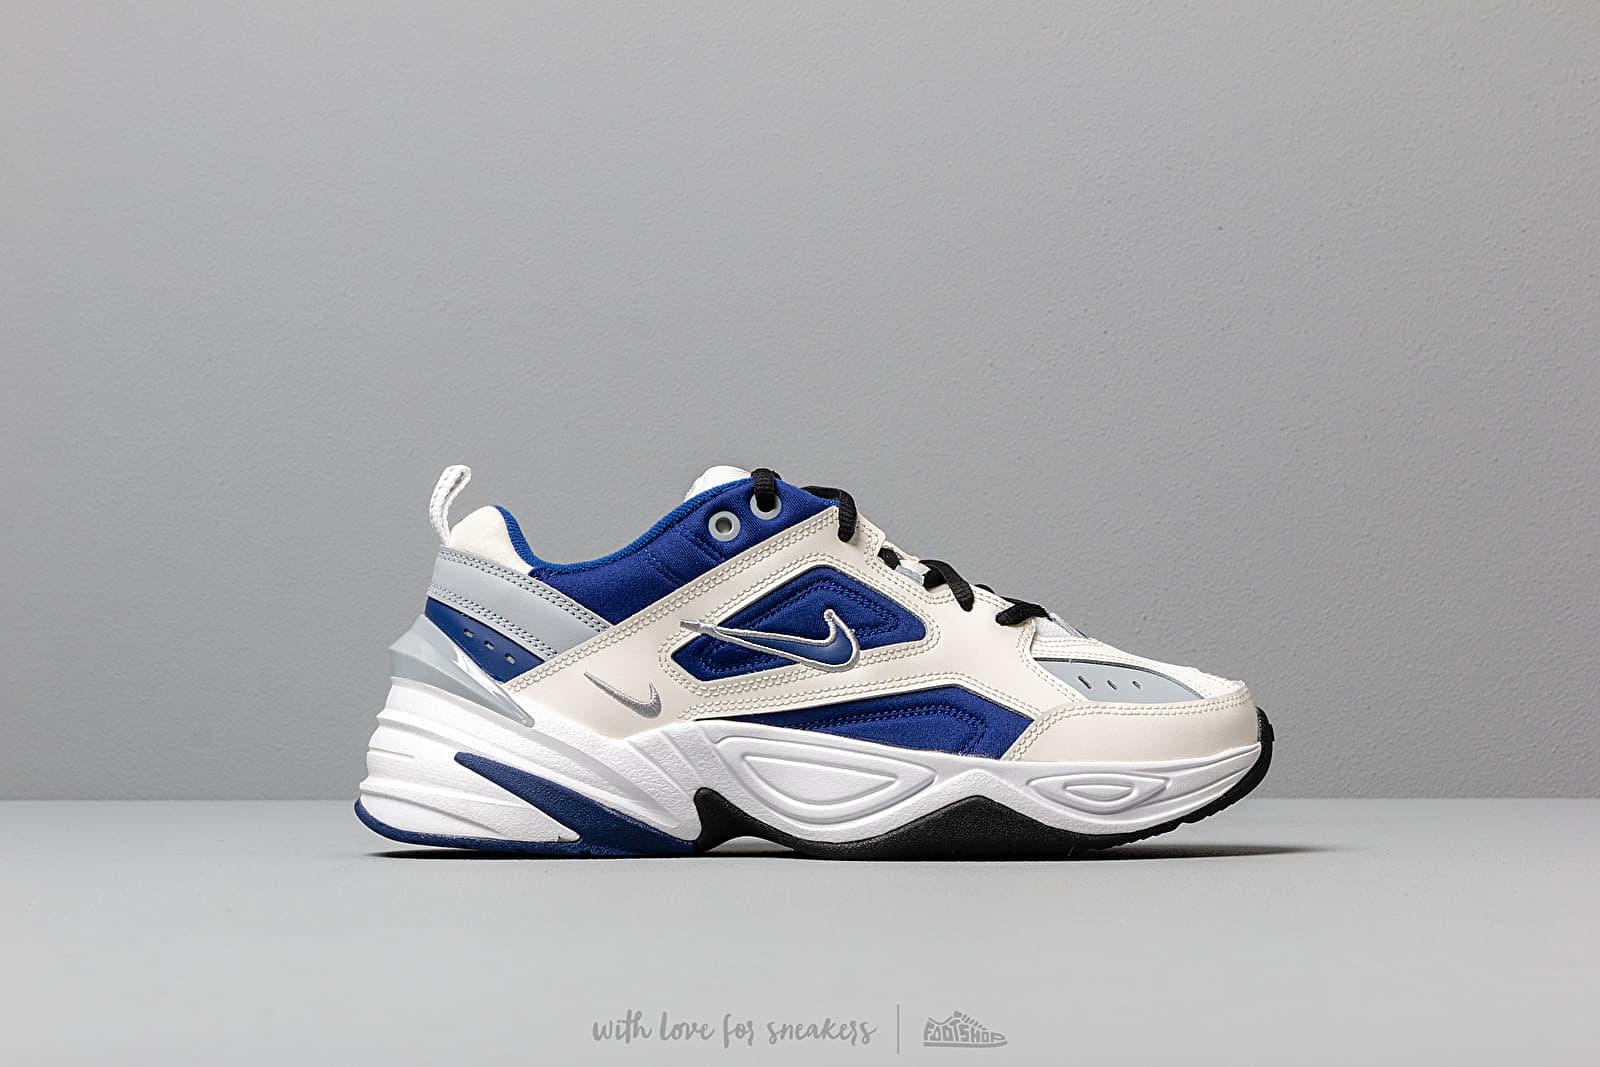 ca60cea2 Nike M2K Tekno Sail/ Deep Royal Blue-Wolf Grey-White at a great